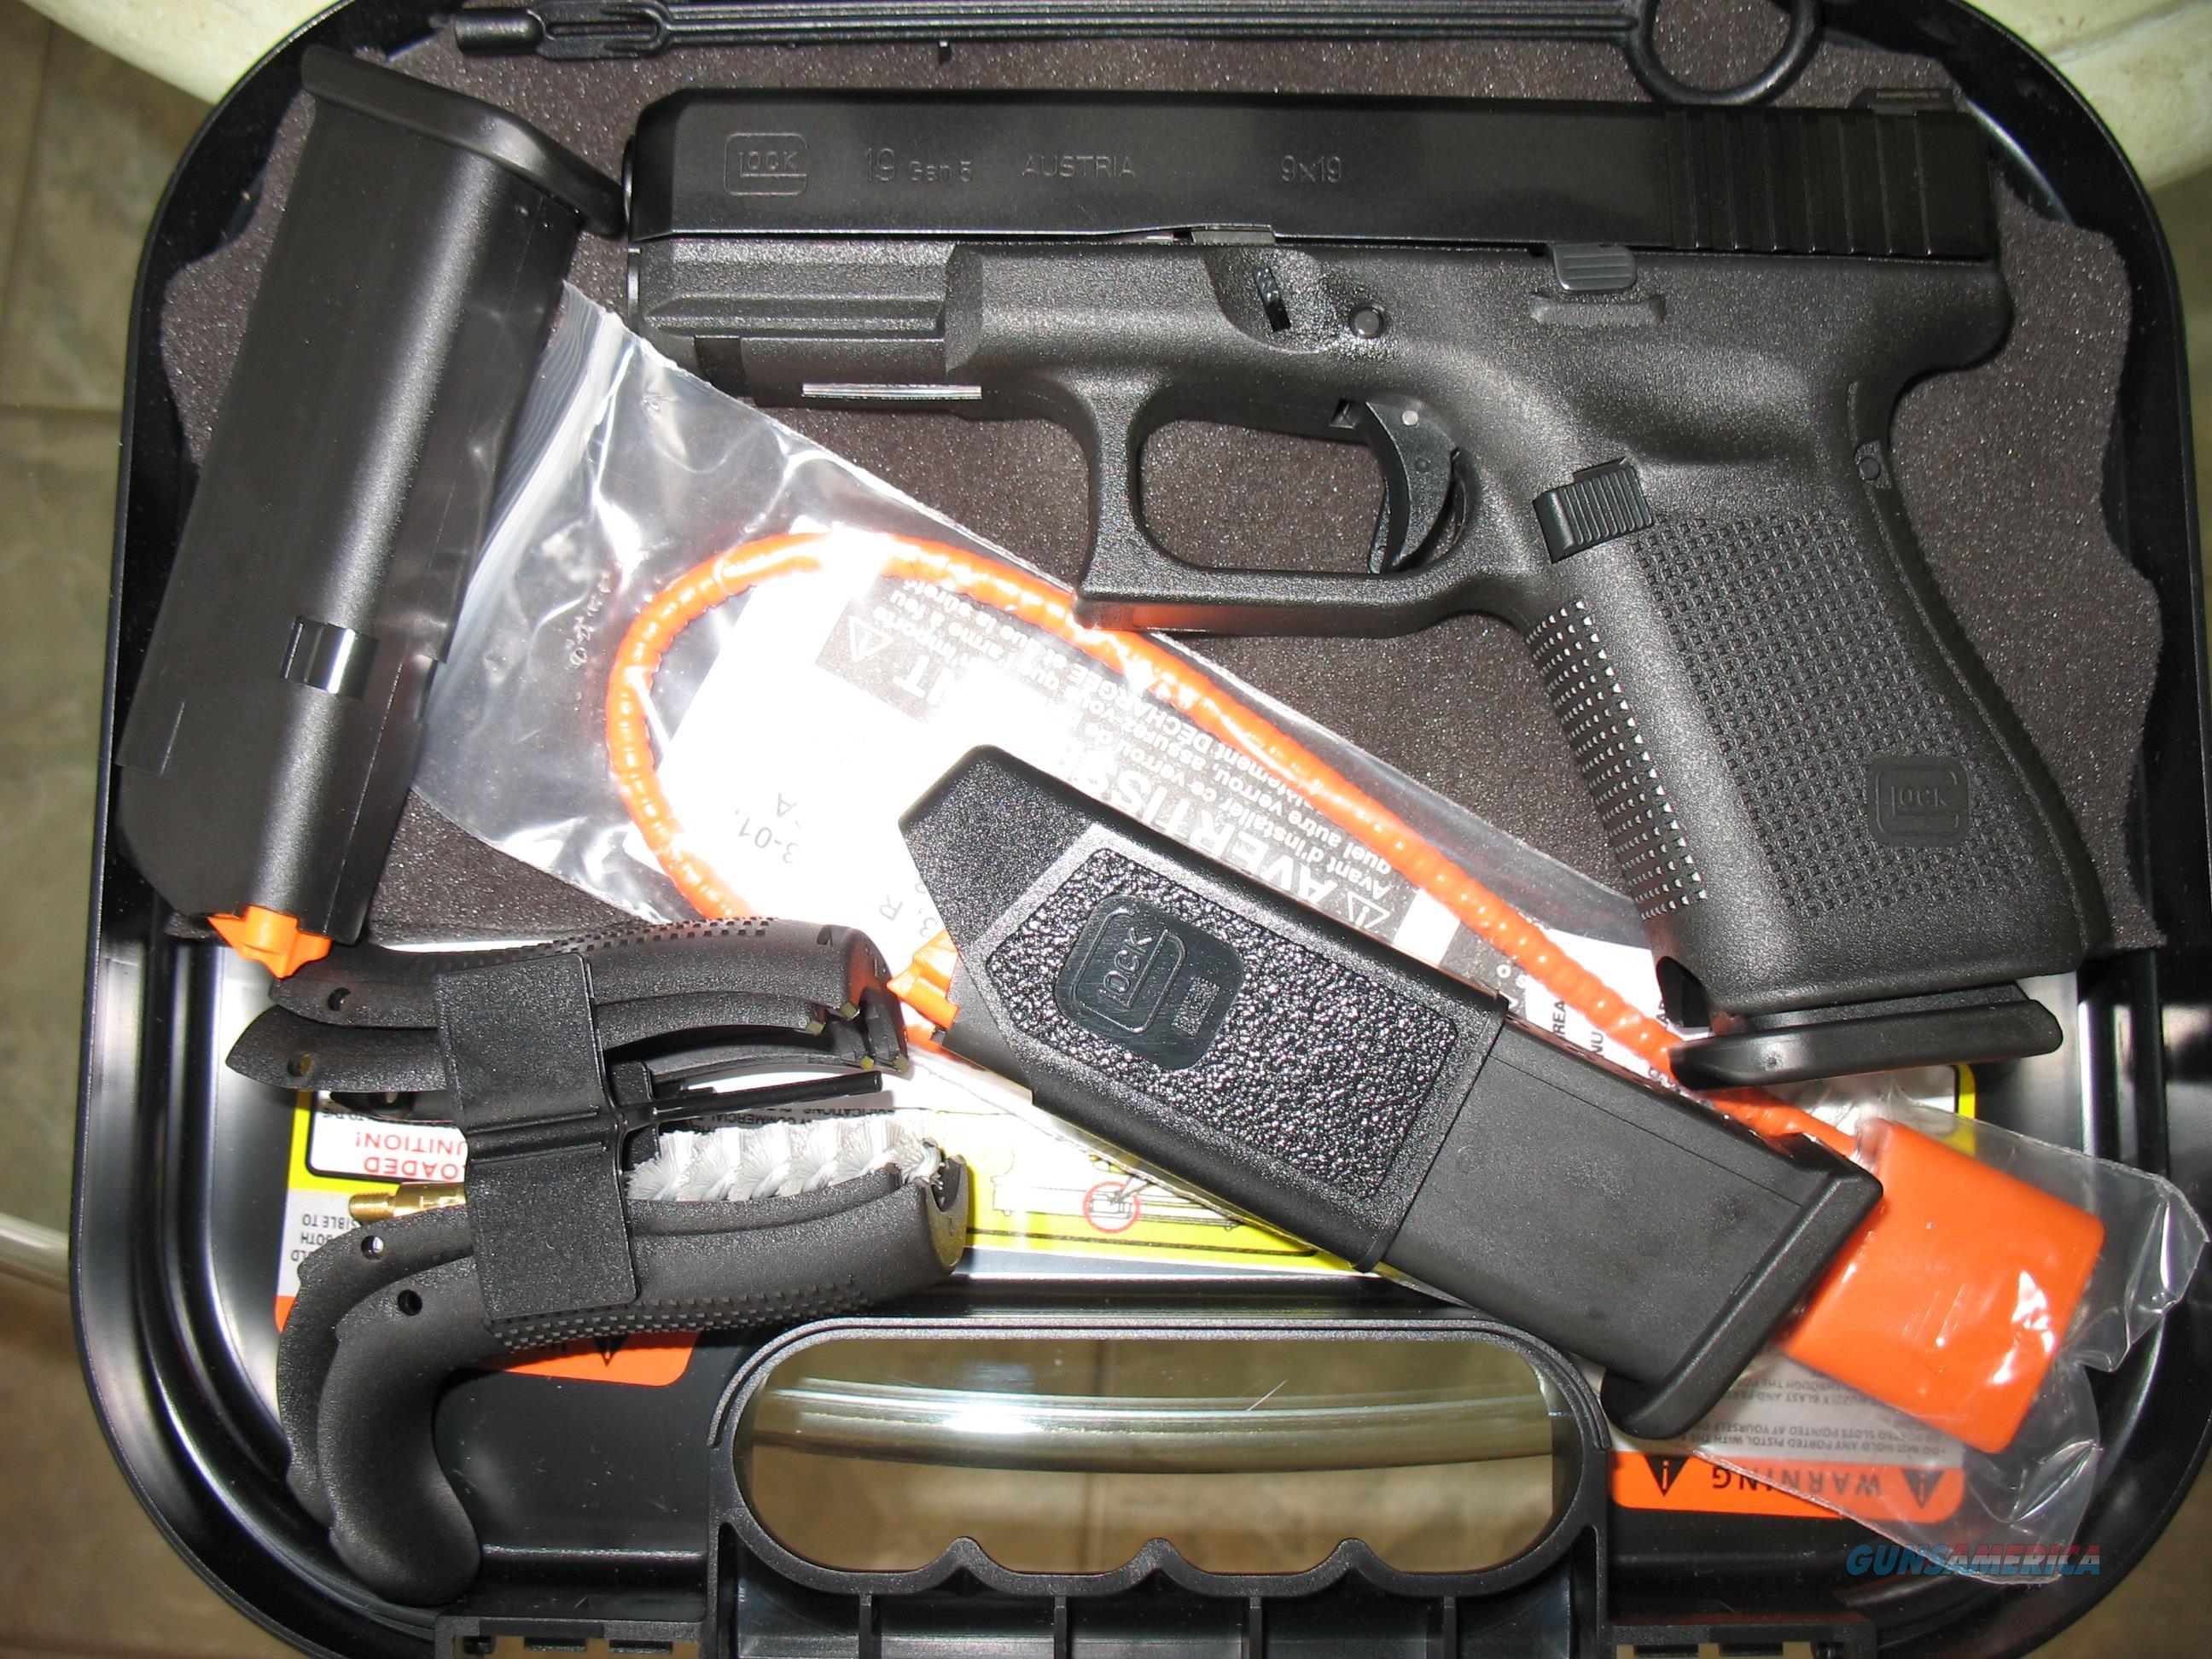 NIB Glock 19 9MM GEN5 AMERIGLO BOLD NIGHTS!  Guns > Pistols > Glock Pistols > 19